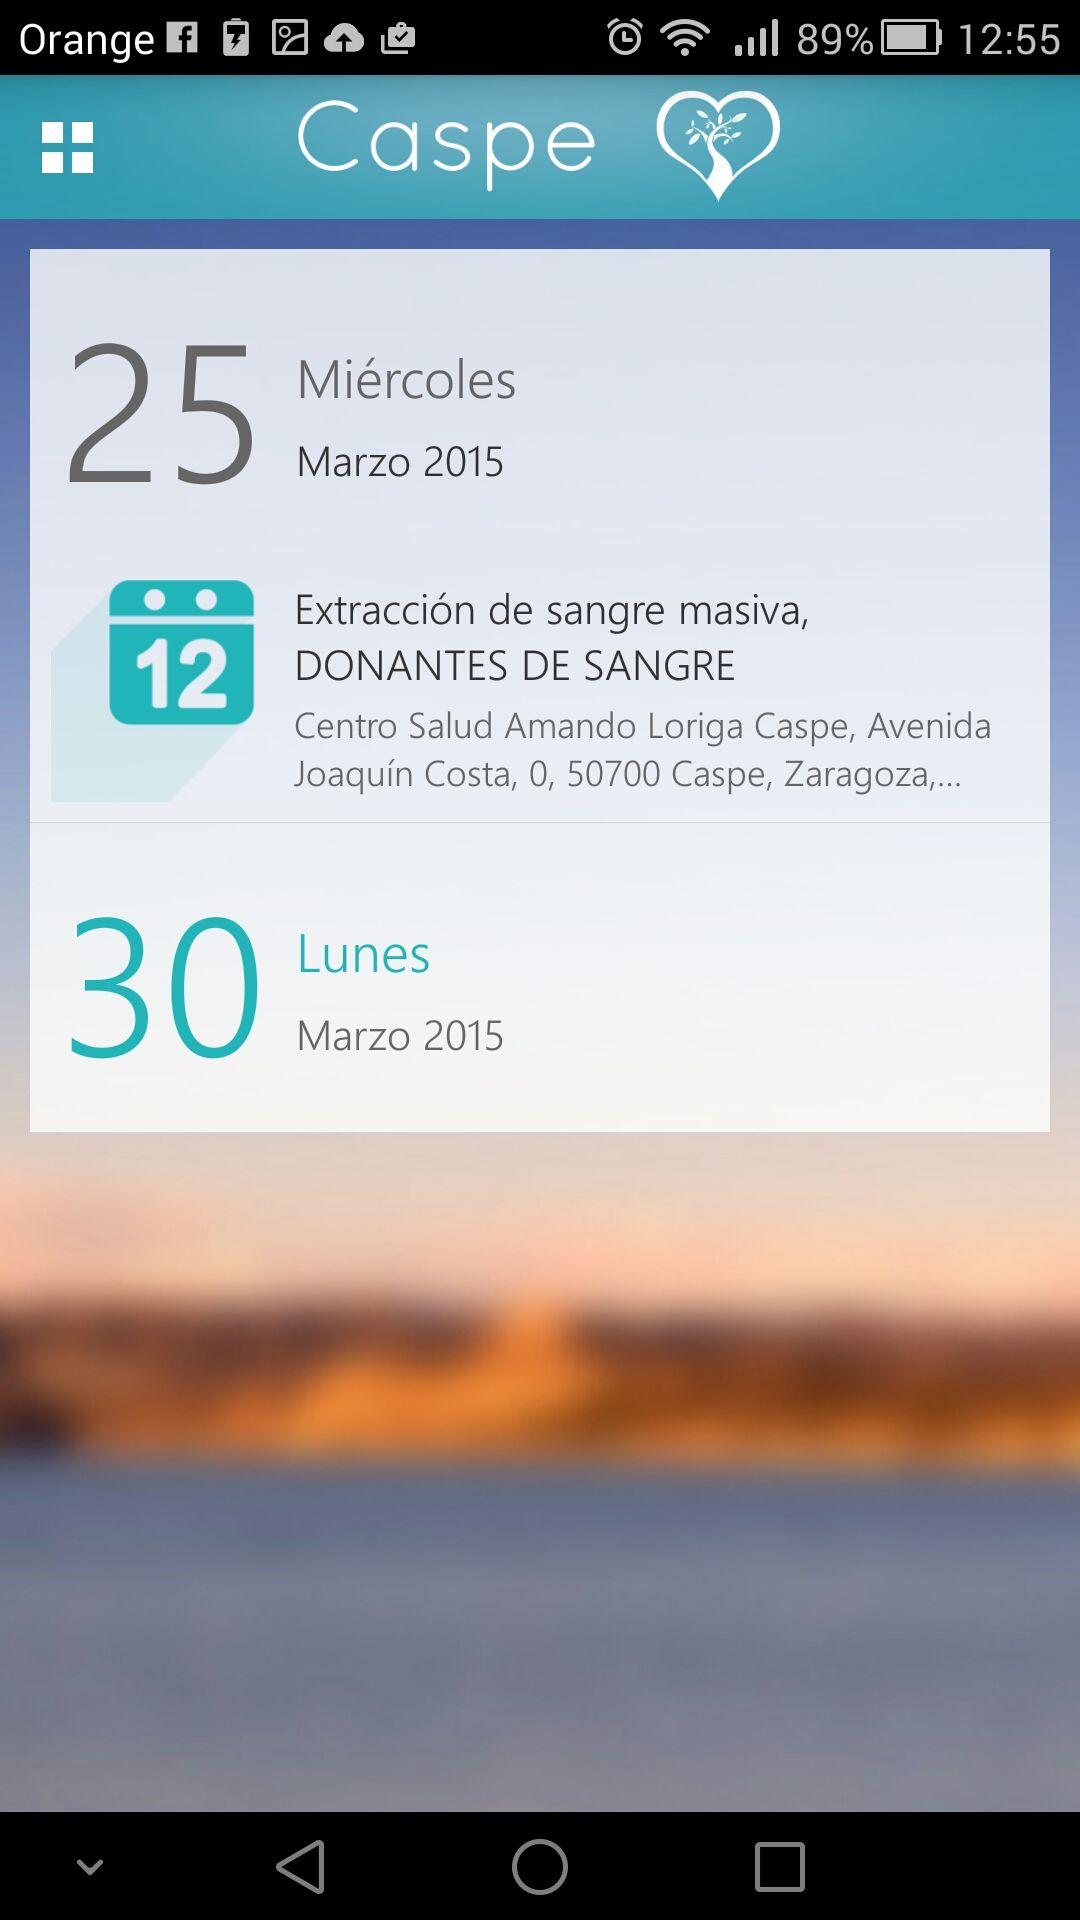 pantallazo_app_caspe_entu_bolsillo_09